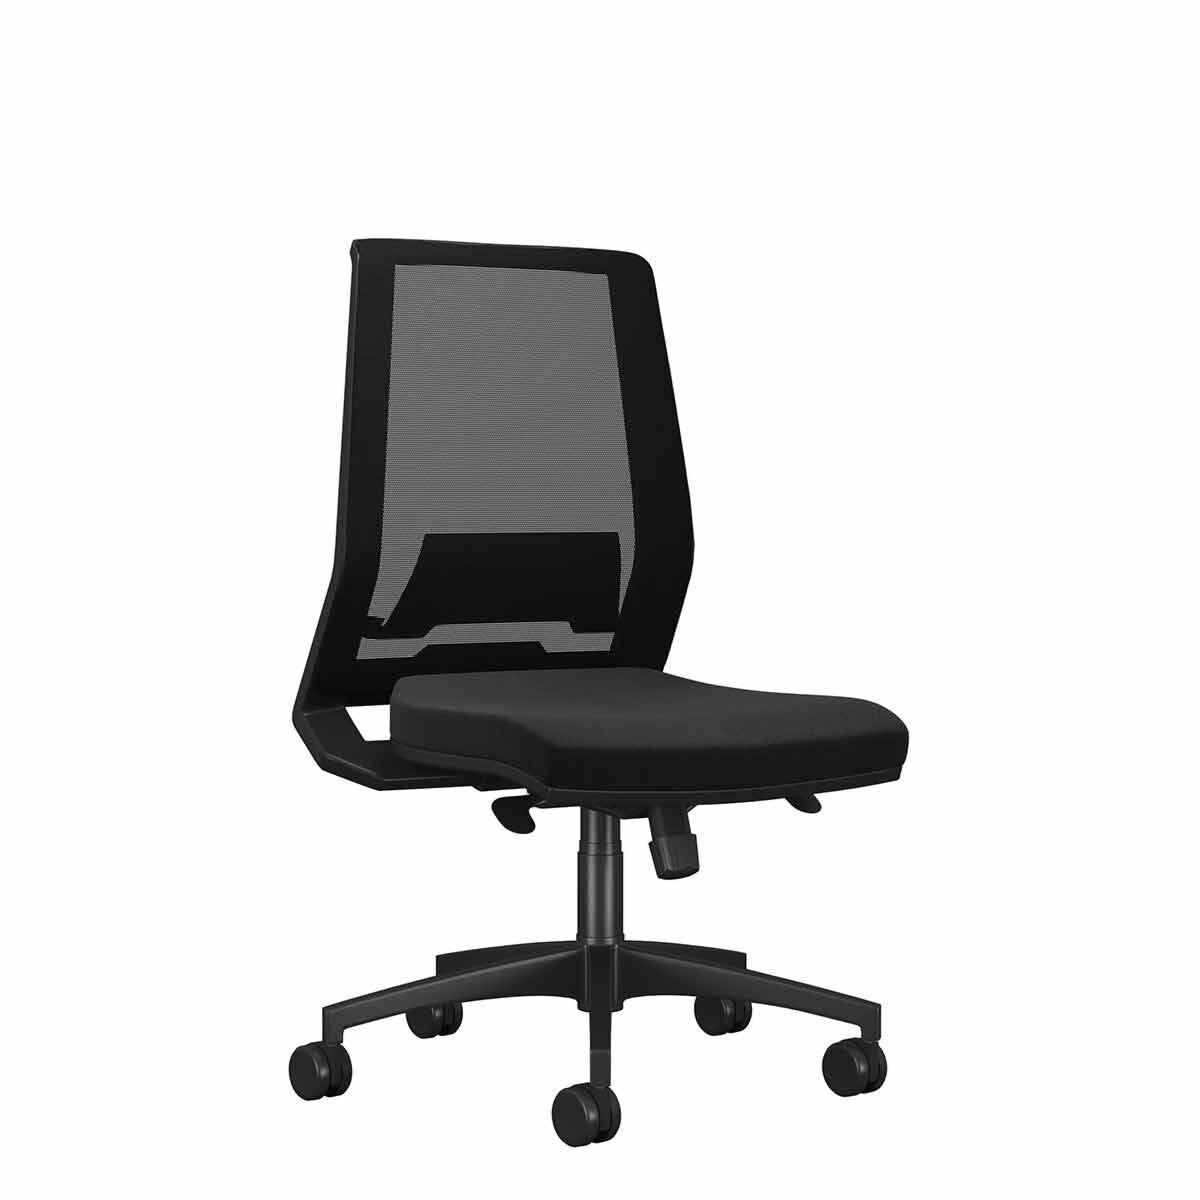 TC Office Rome Mesh High Back Chair